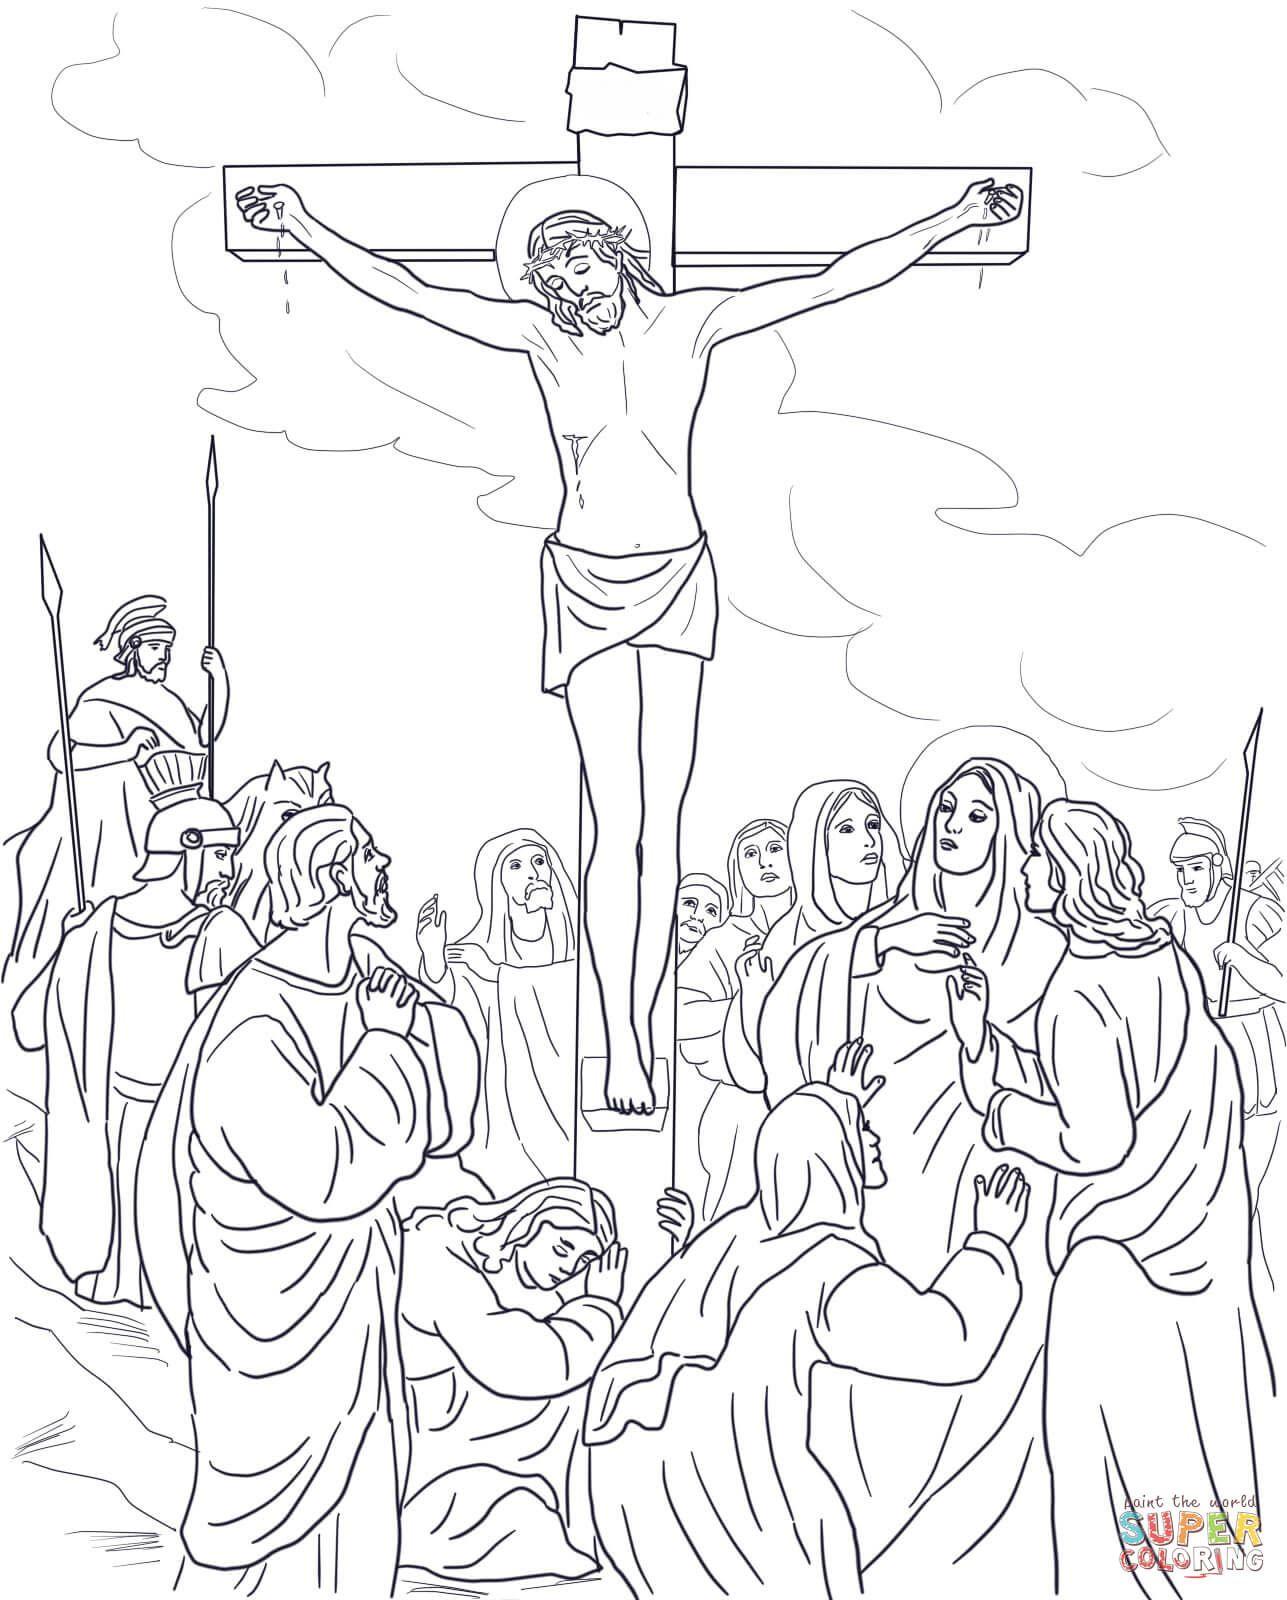 Twelfth Station - Jesus Dies on the Cross | Super Coloring | Easter ...